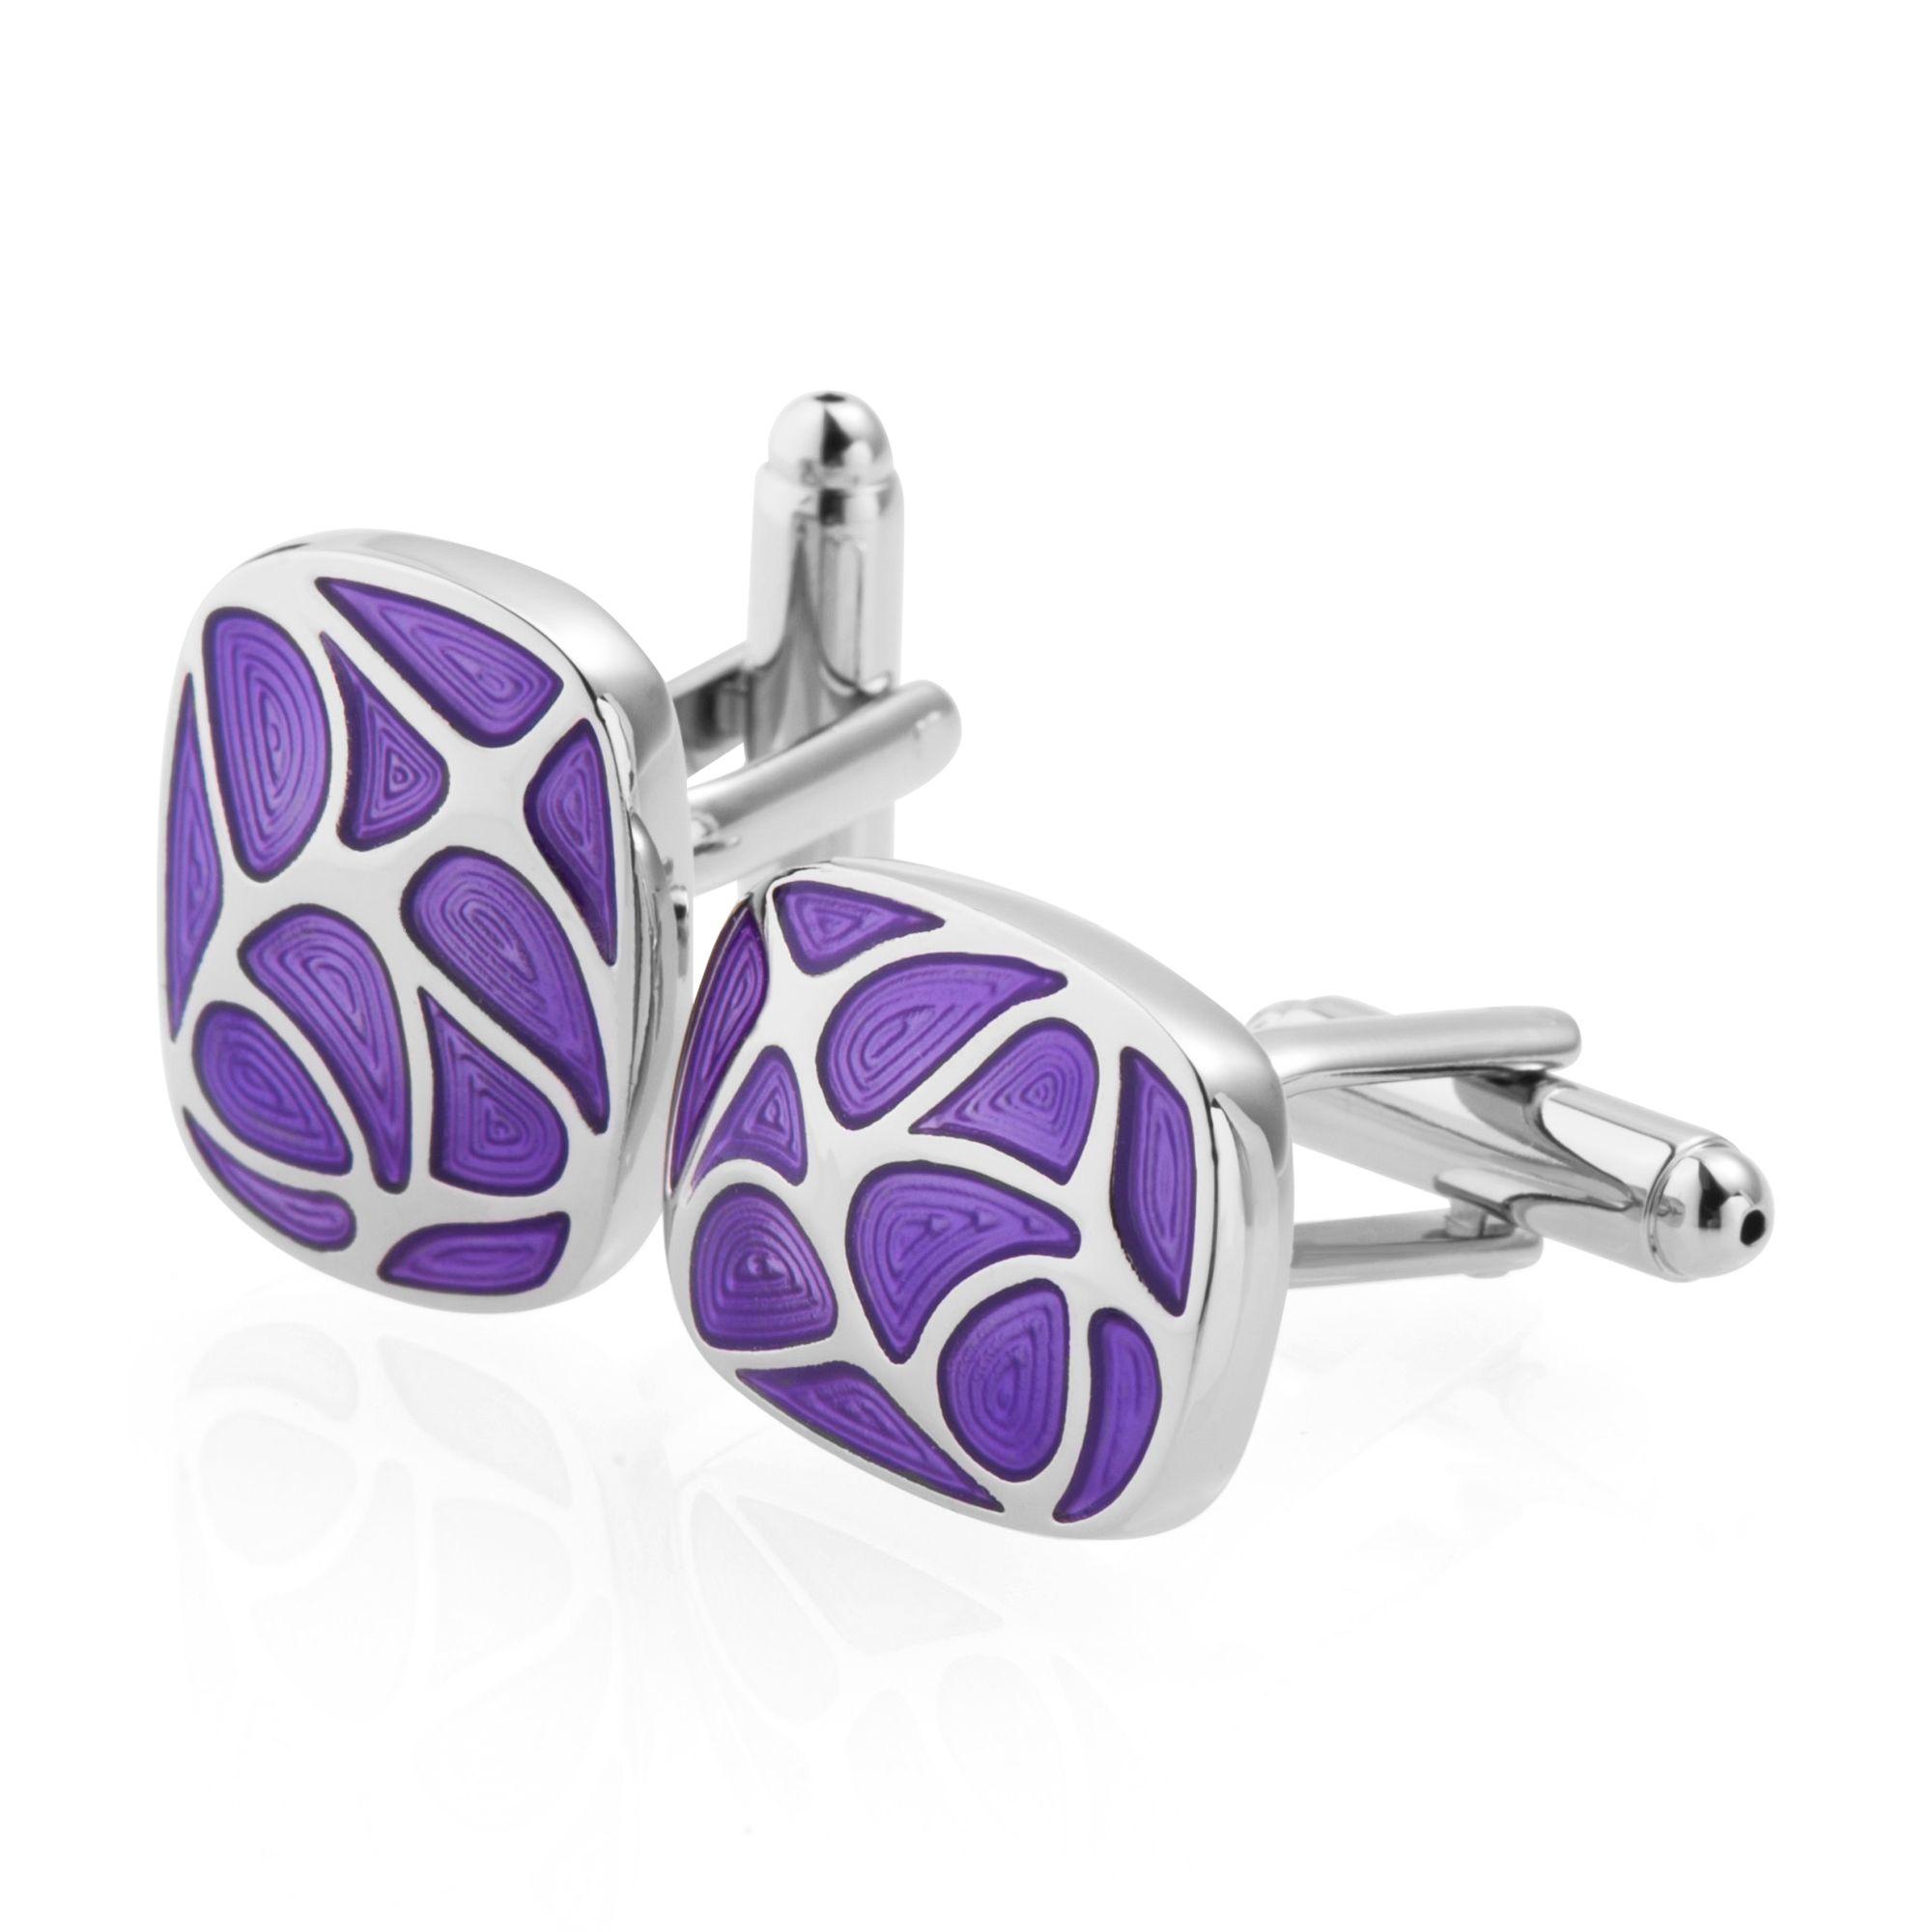 Cufflinks for men by Zodaca Fashion Mens Cufflink Business Wedding Stainless Steel Cuff Links Fingerprint - Purple/Silver